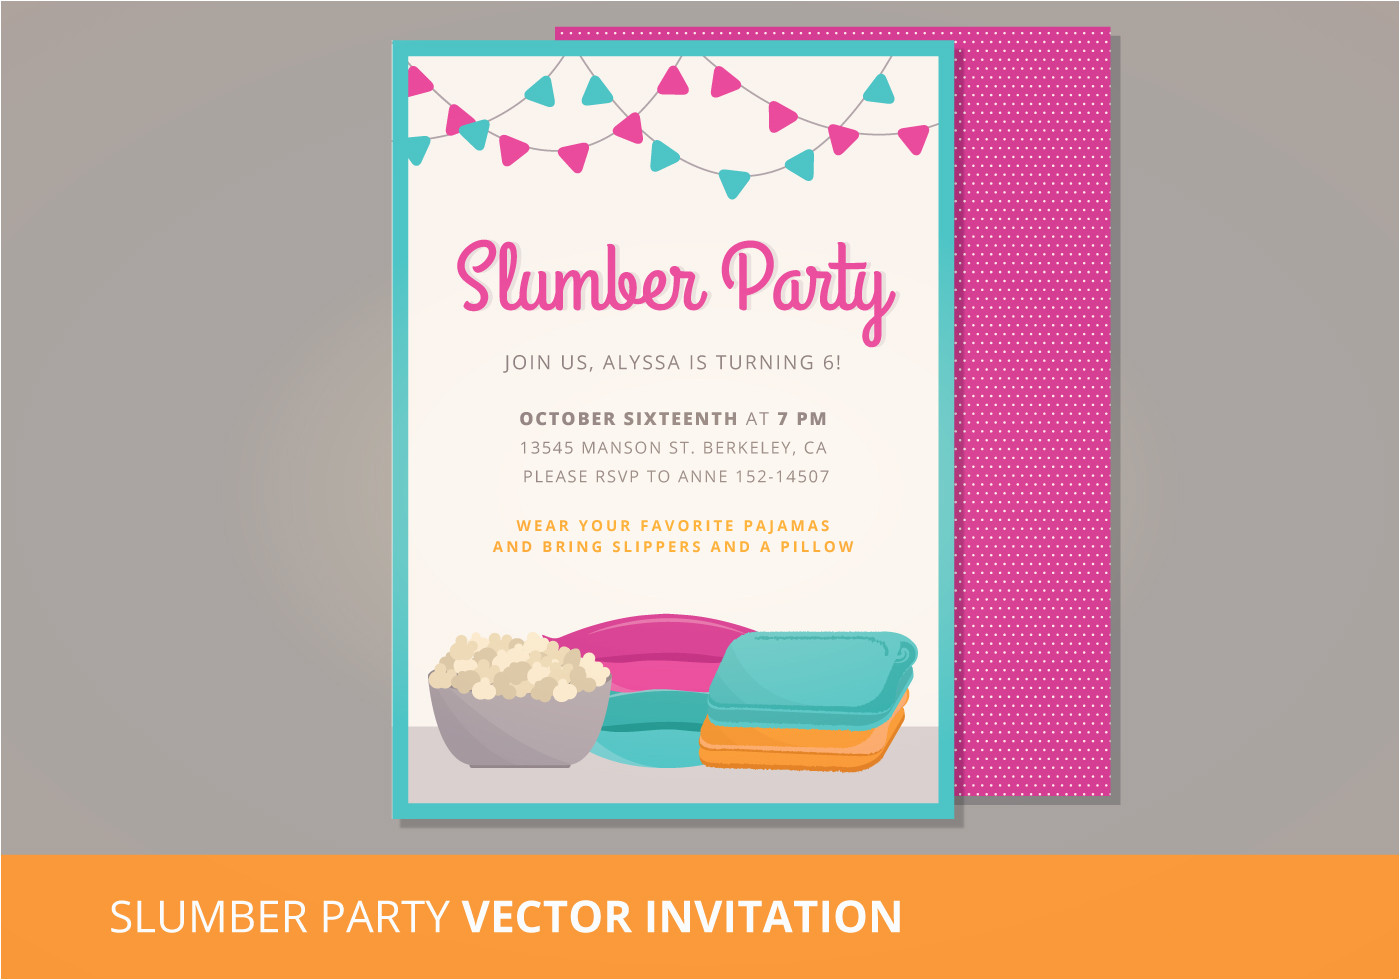 97486 slumber party vector invitation